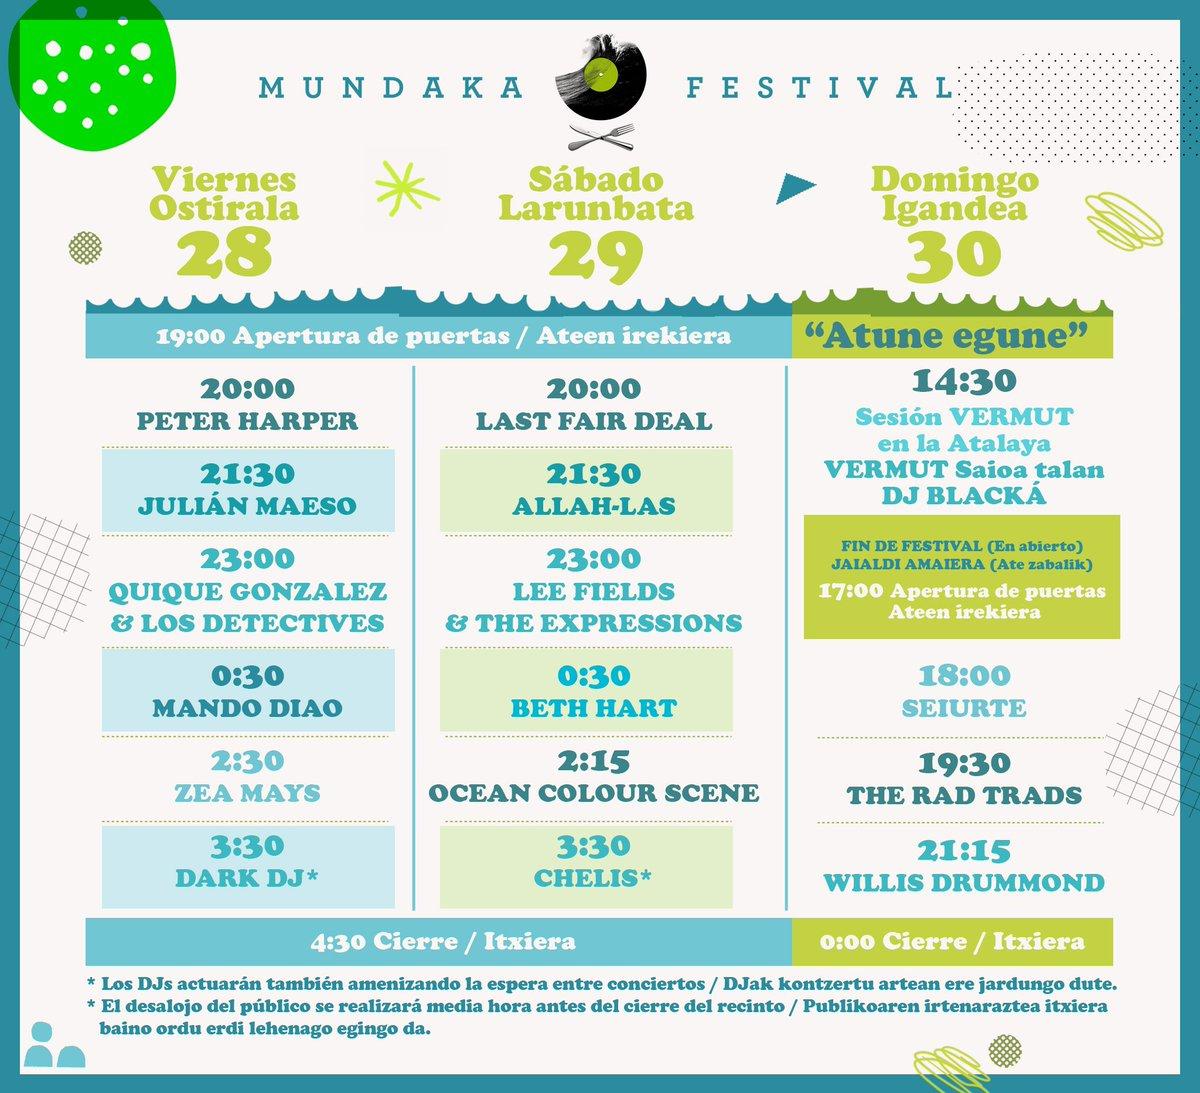 Cartel del Mundaka Festival 2017